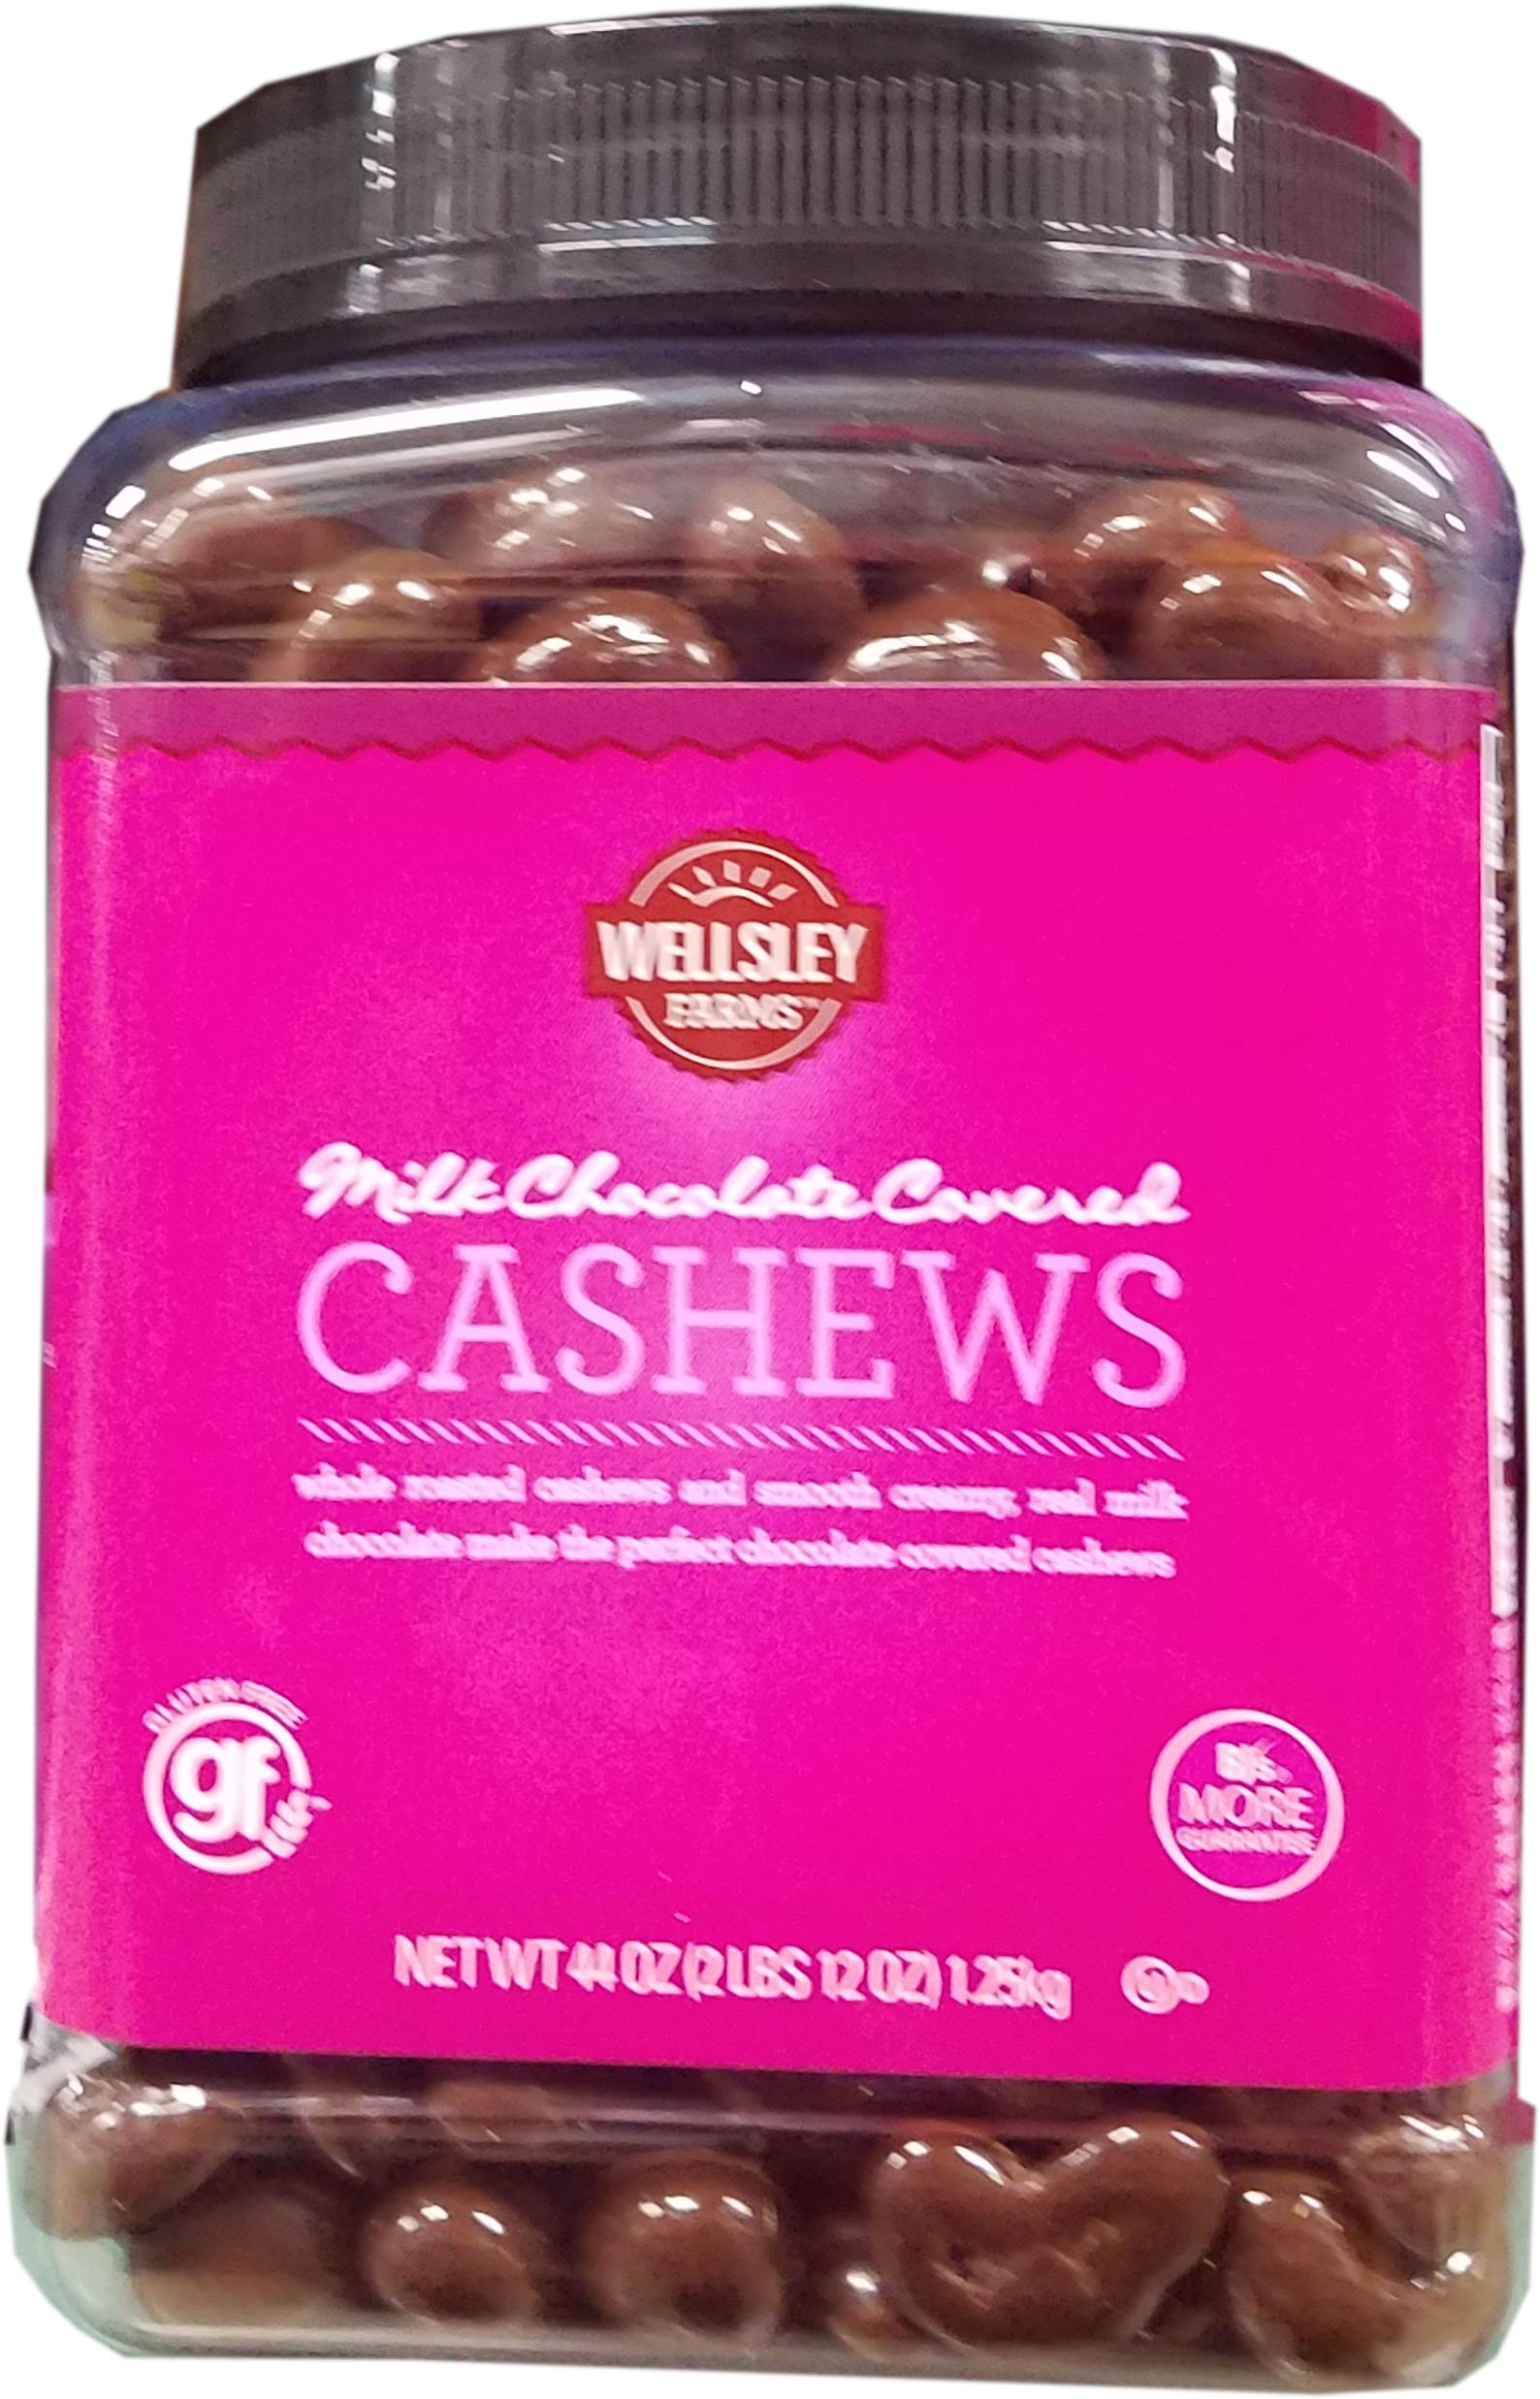 Wellsley Farms Milk Chocolate Covered Cashews, 44 OZ by Wellsley Farms